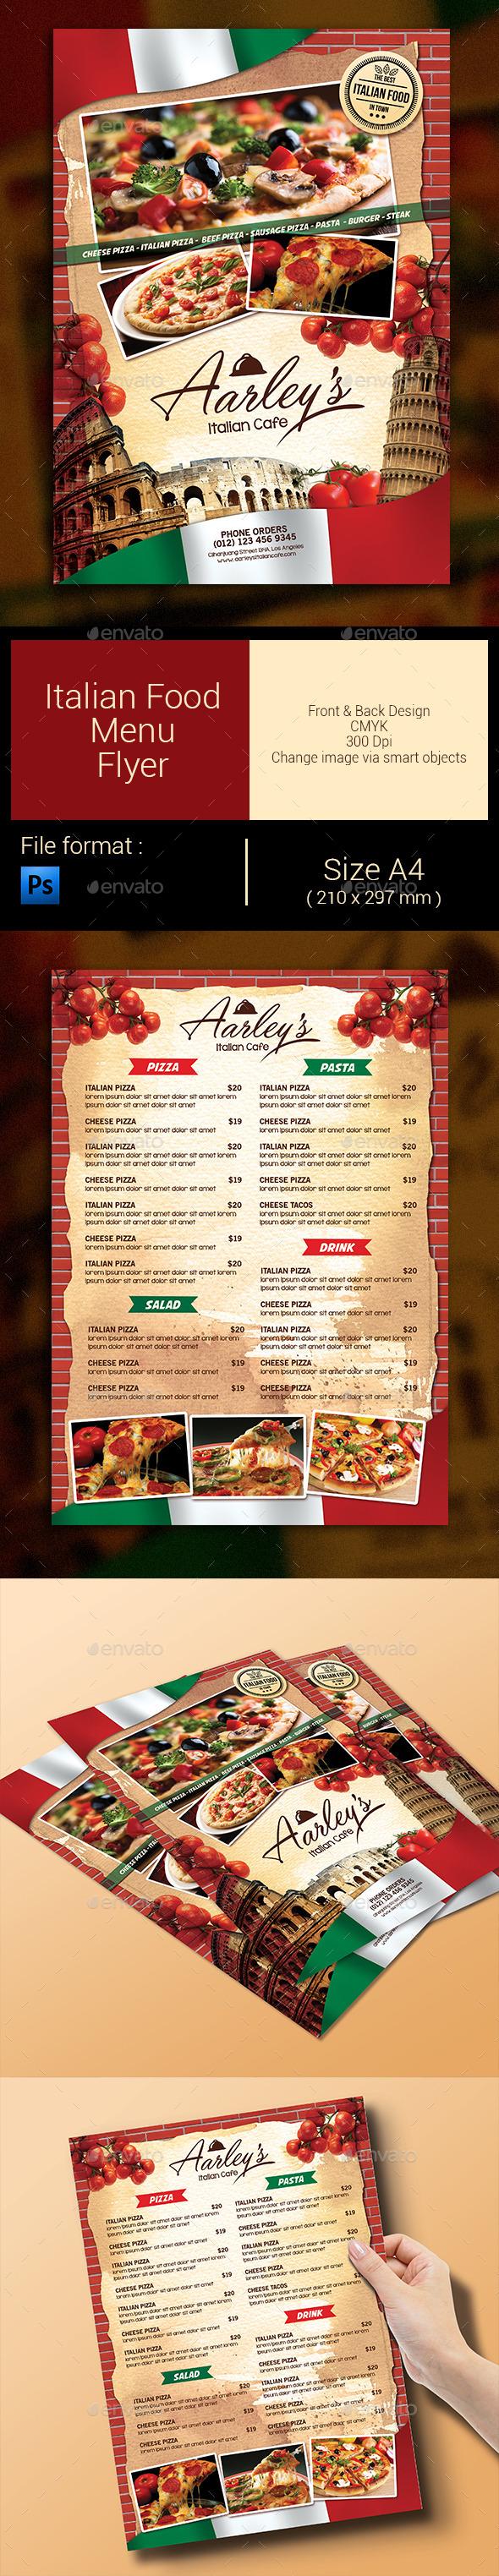 Italian Food Menu Flyer - Food Menus Print Templates